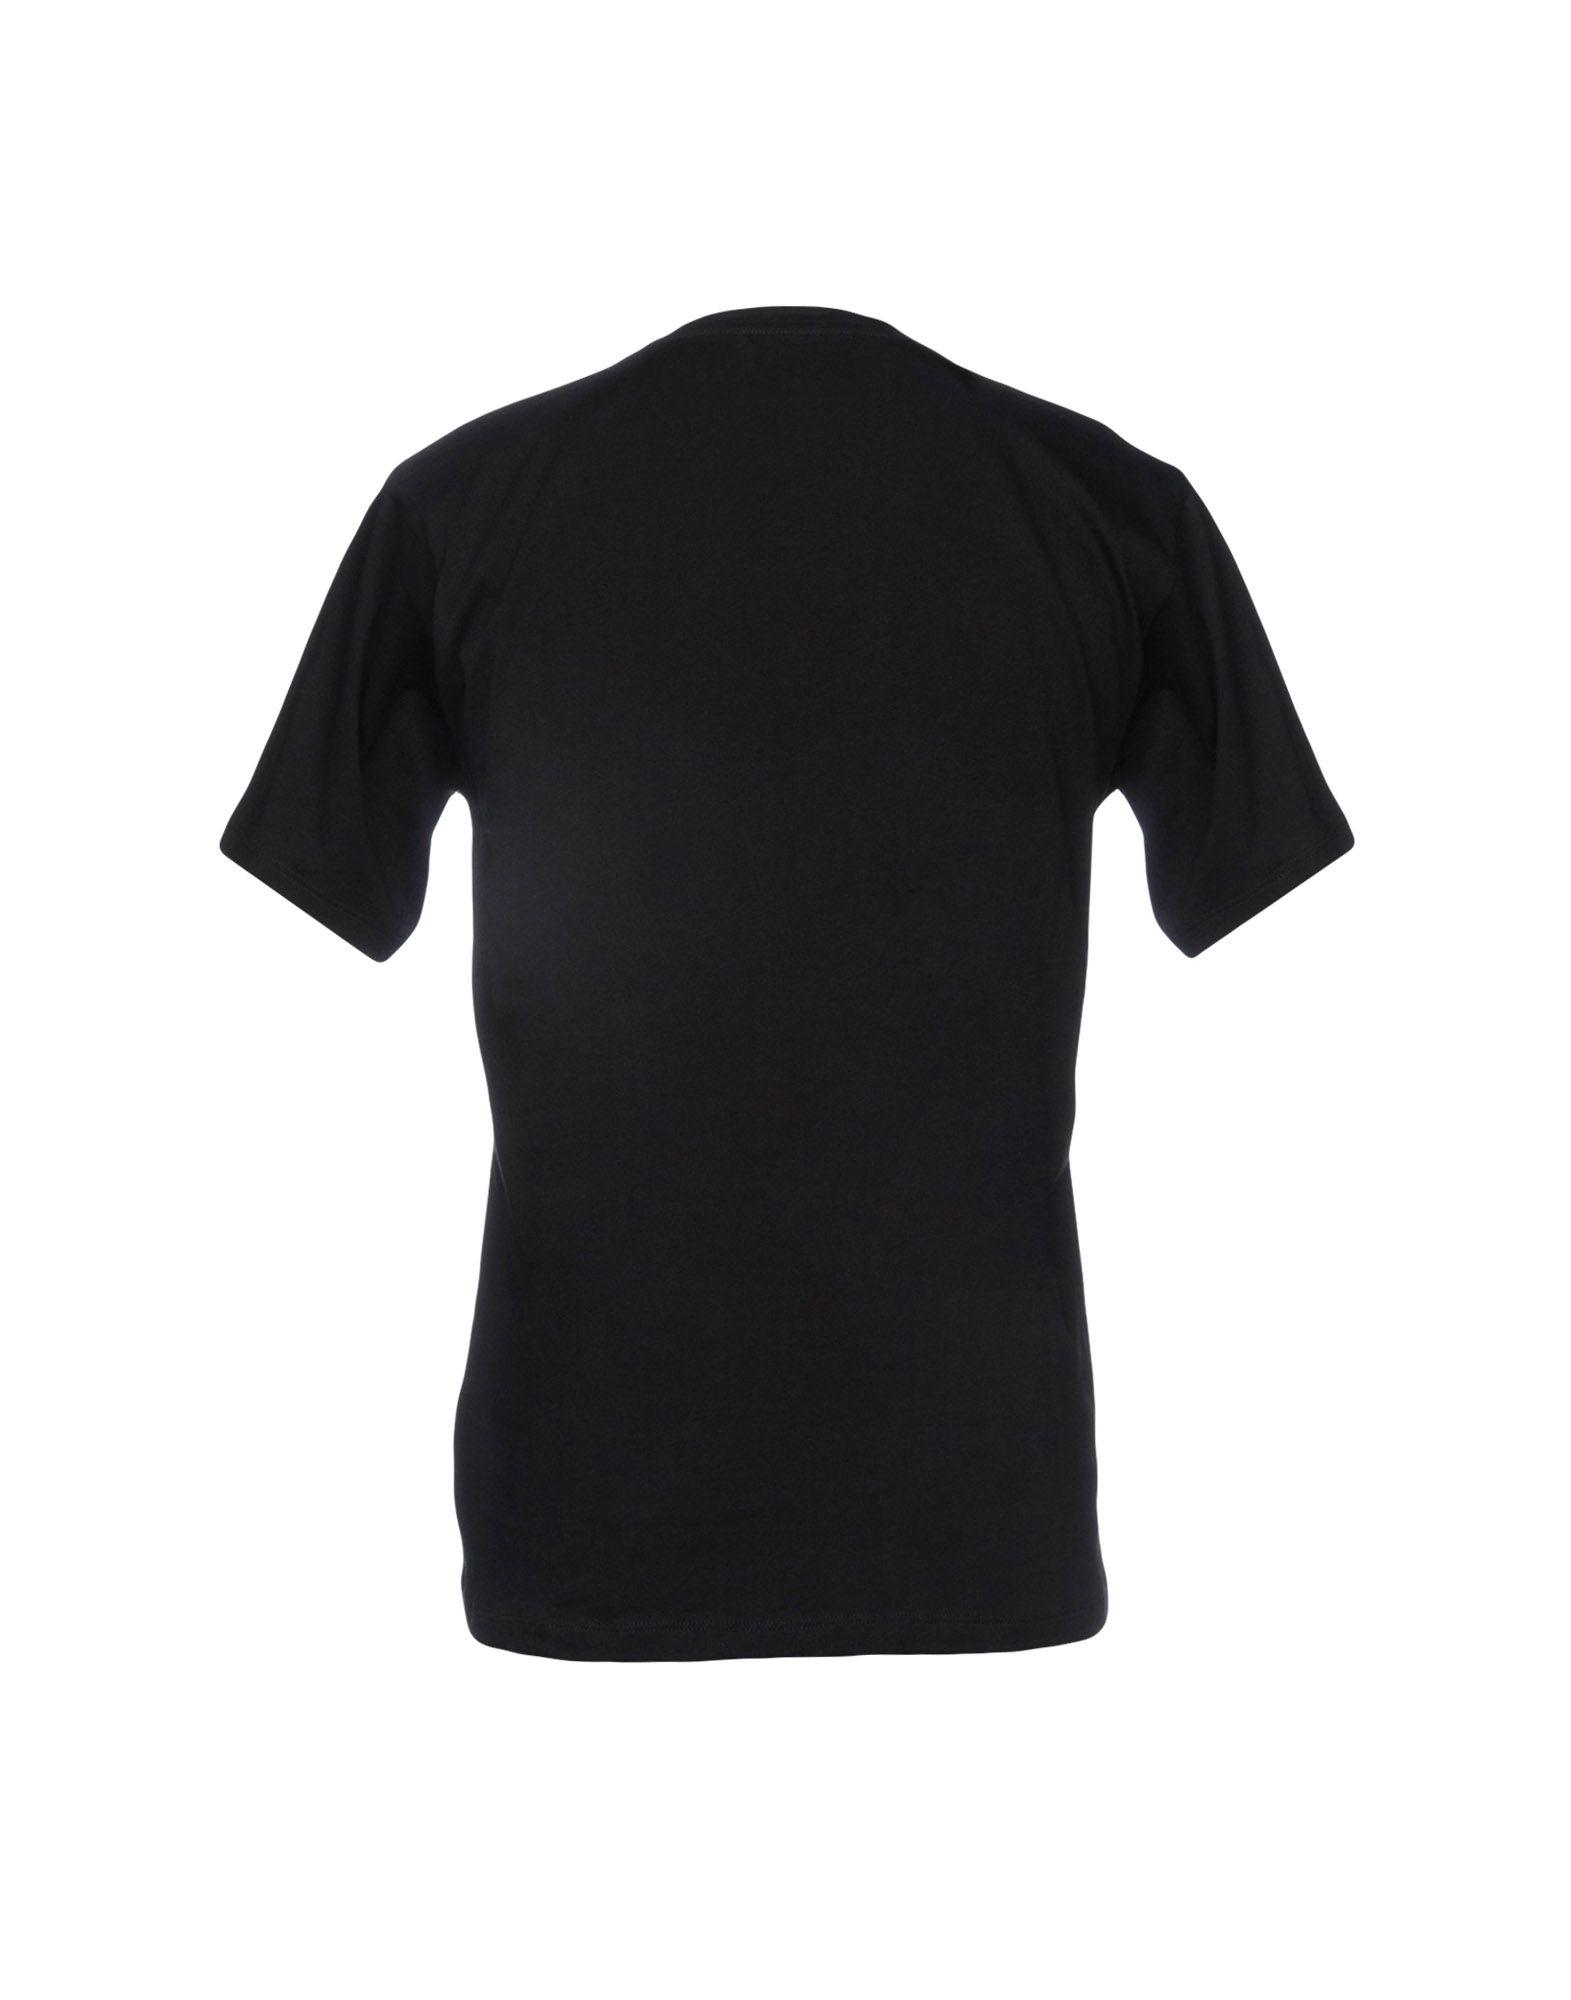 T-Shirt C.Y.H. Clap Your Hand Uomo Uomo Hand - 12112733XN 95061c